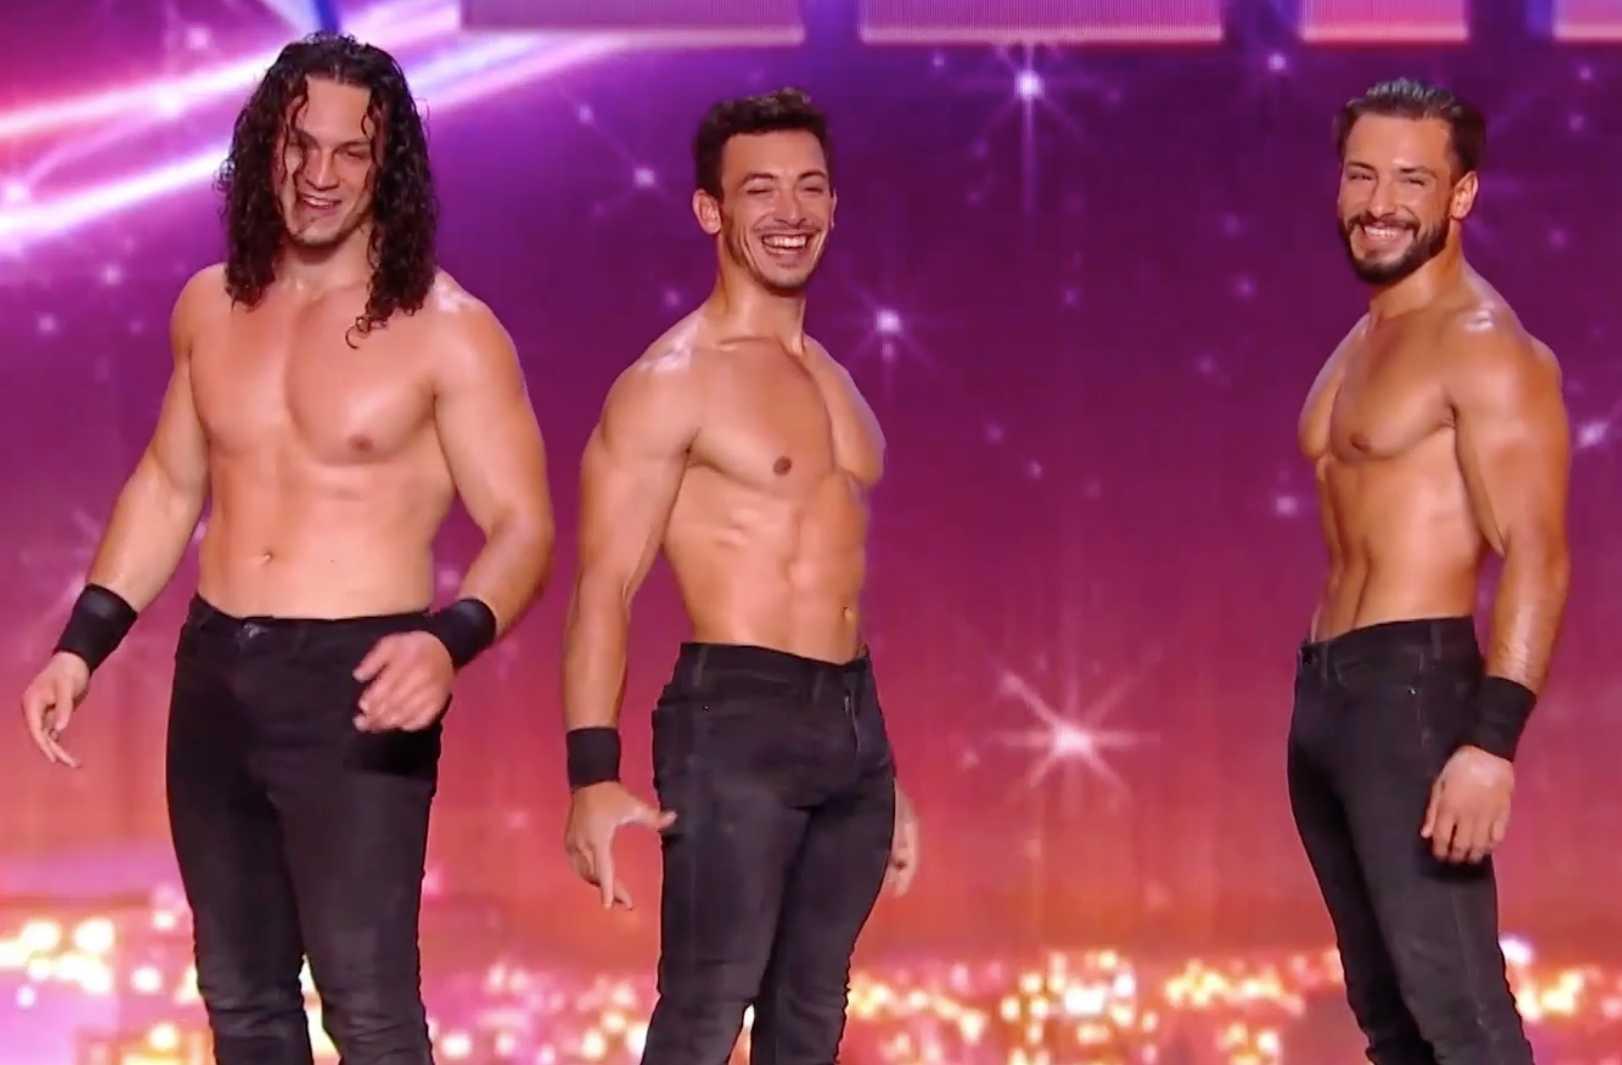 Exclu La France A Un Incroyable Talent Un Trio Sexy Affole Marianne James Video